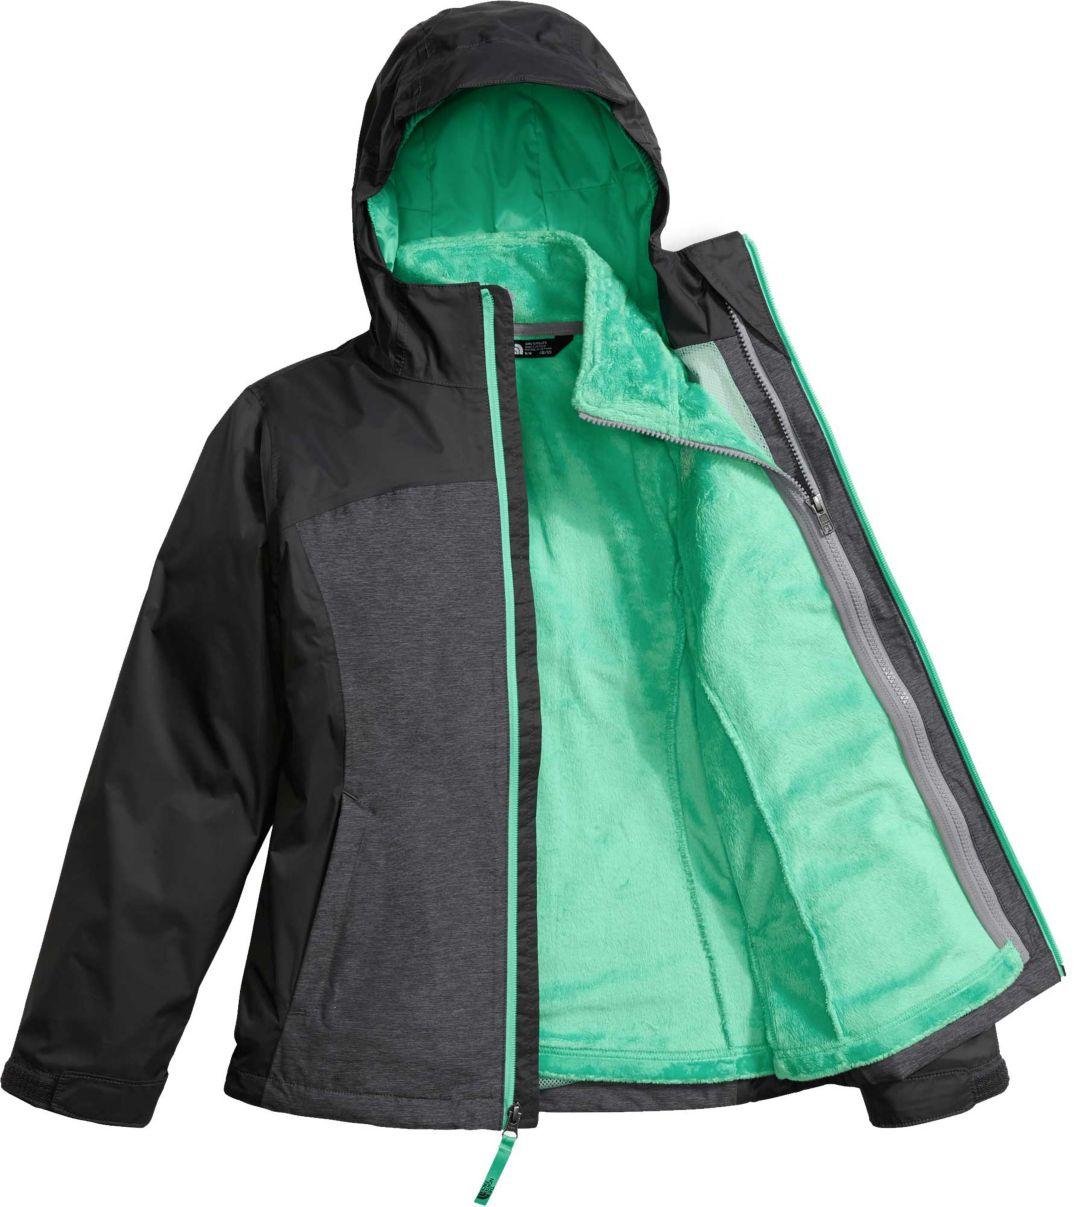 e420e7e1e The North Face Girls' Osolita Triclimate Jacket